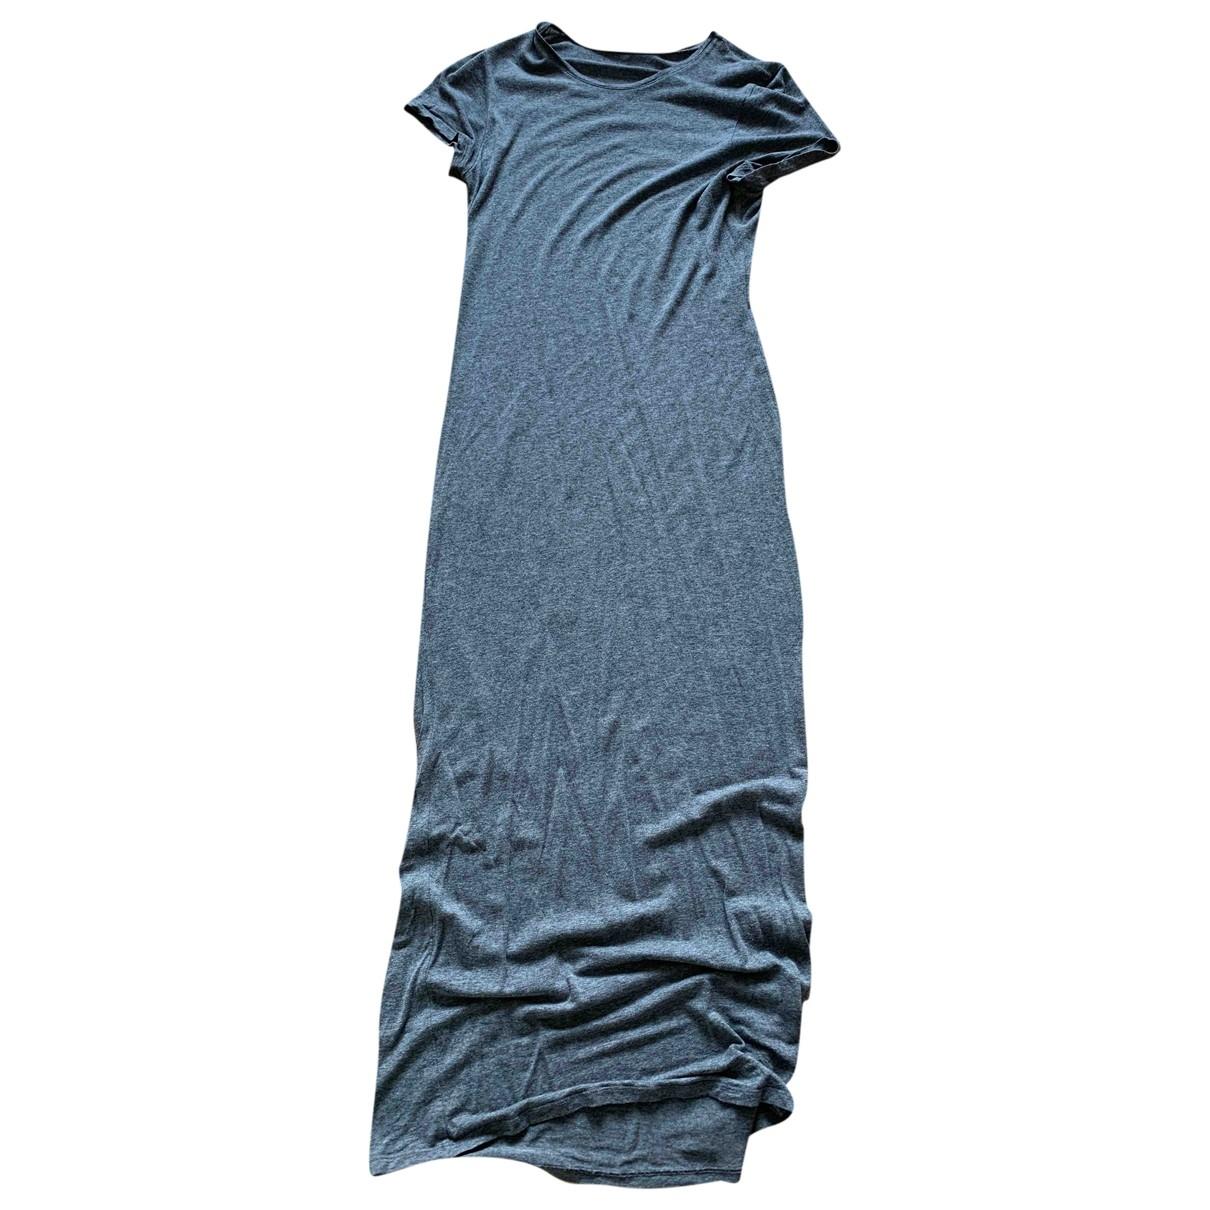 Albertine - Robe   pour femme - gris